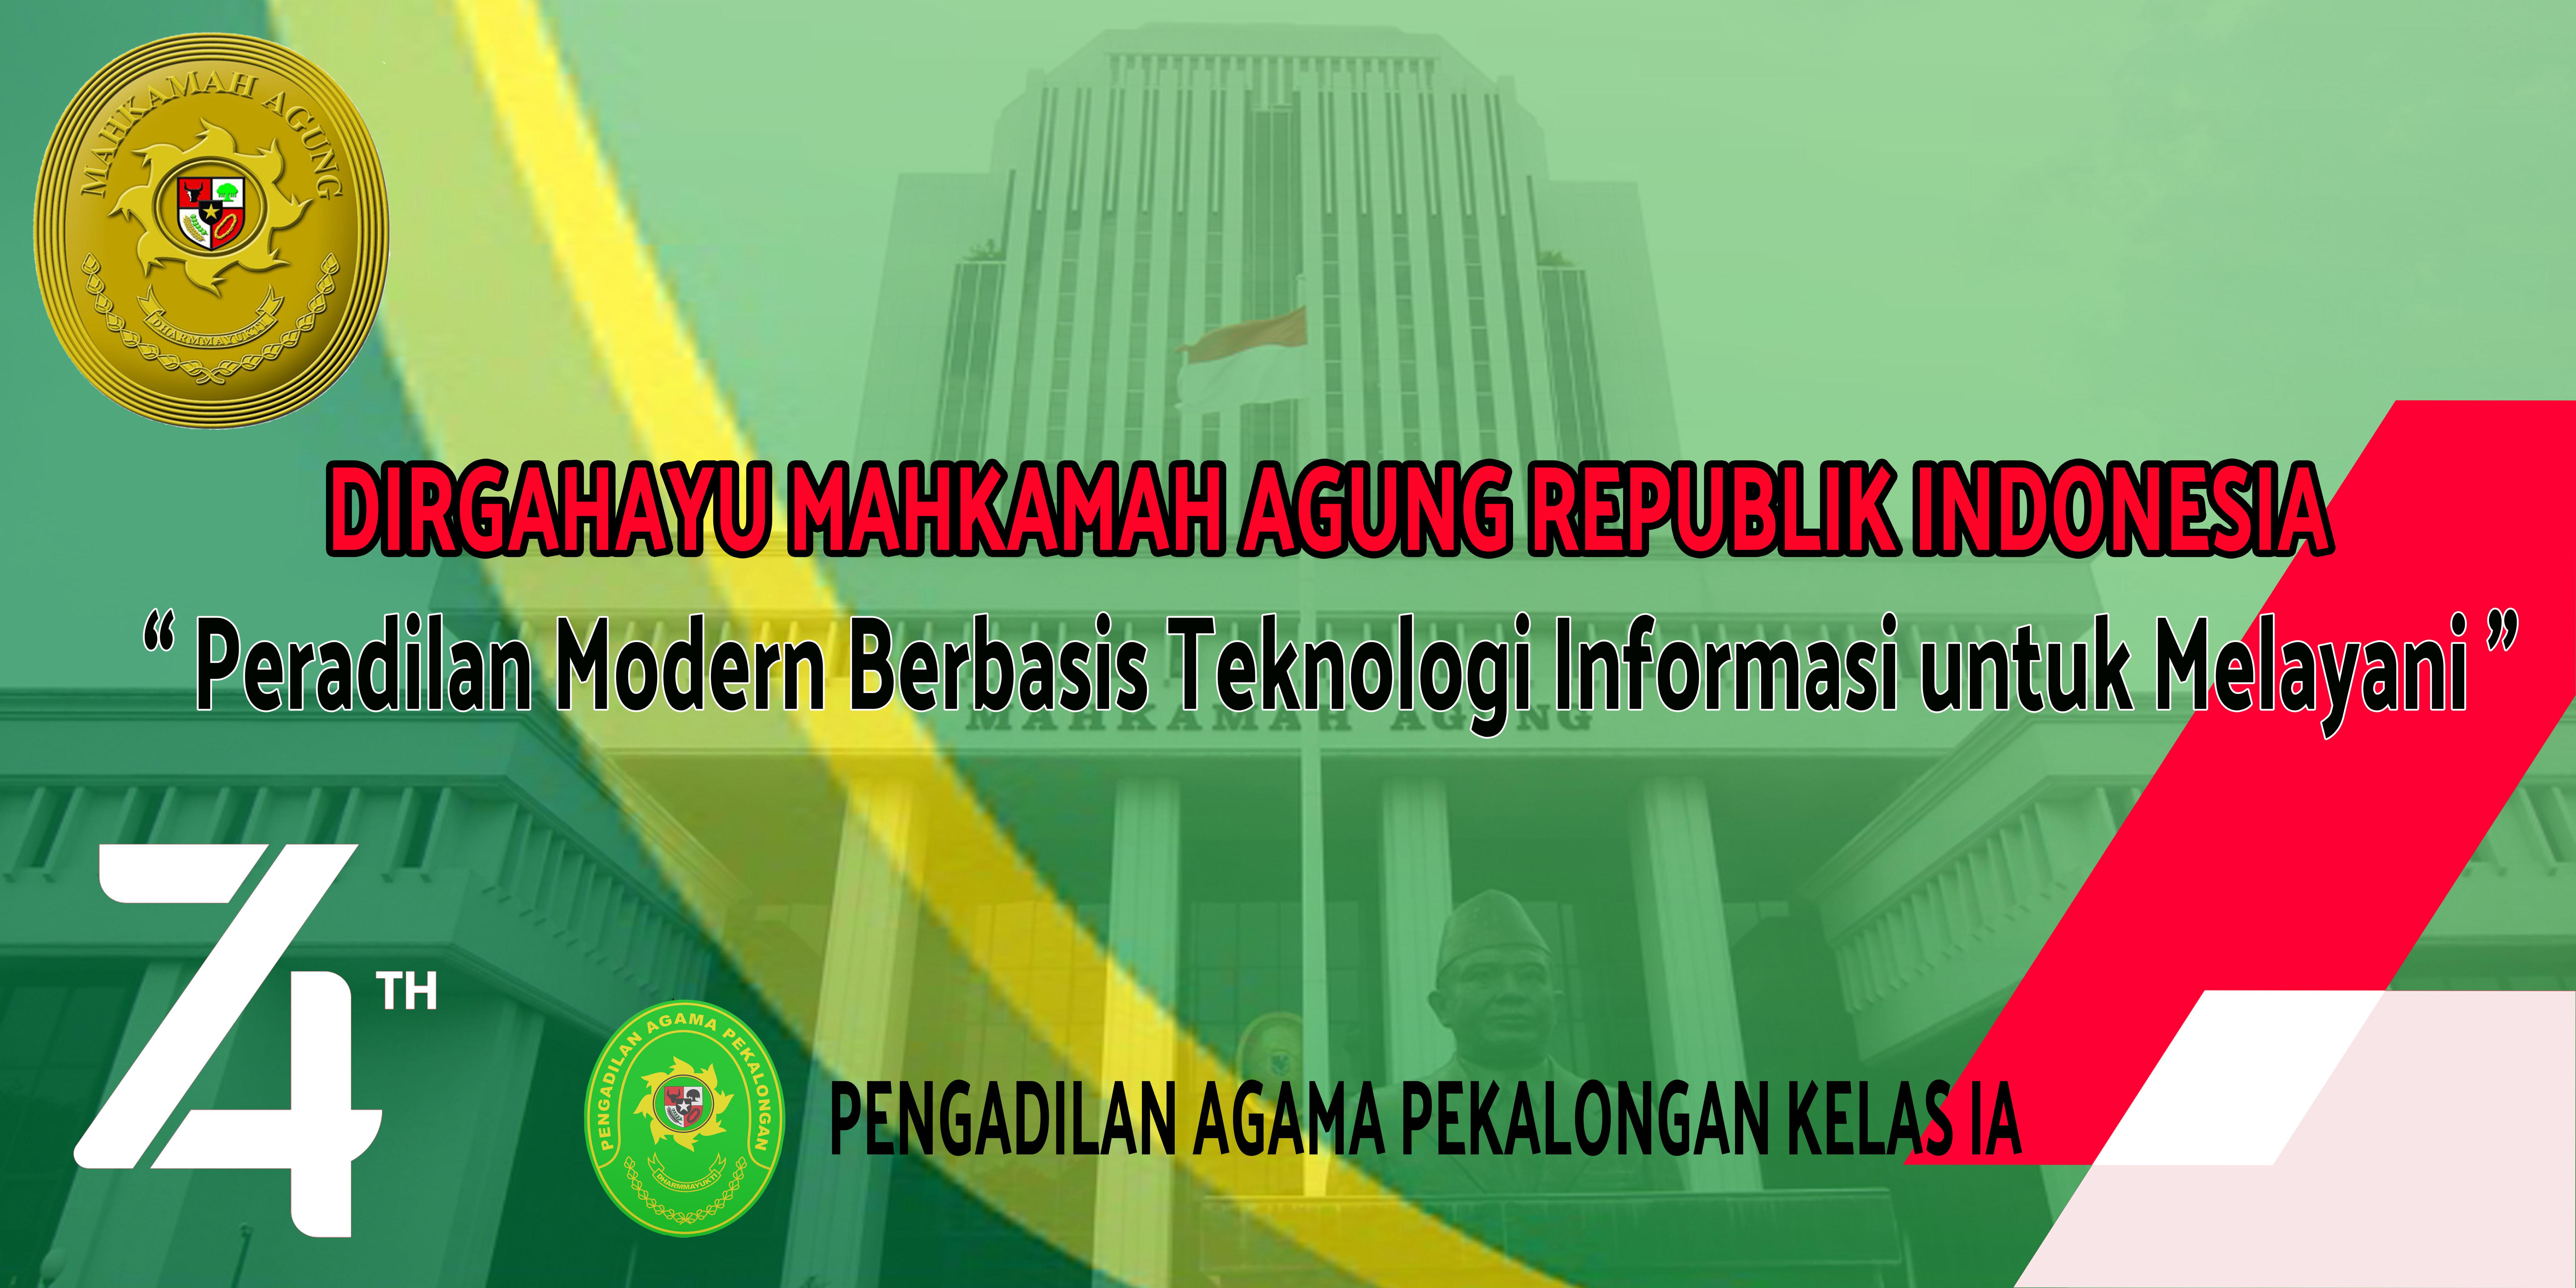 DIRGAHAYU MAHKAMAH AGUNG REPUBLIK INDONESIA YANG KE 74